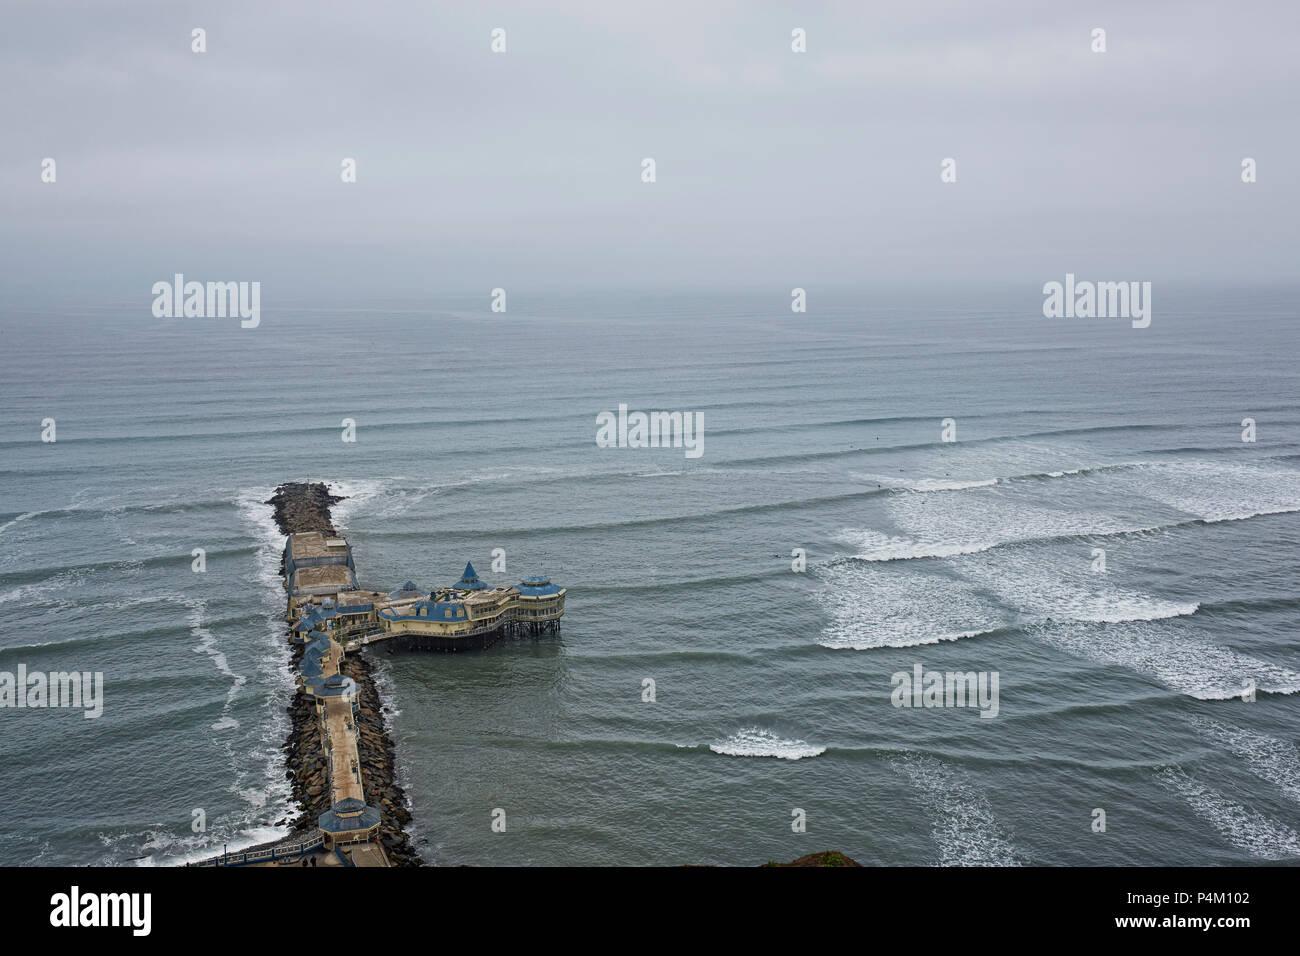 Rosa Nautica Restaurant on pier, Lima Bay, Miraflores, Lima, Peru - Stock Image